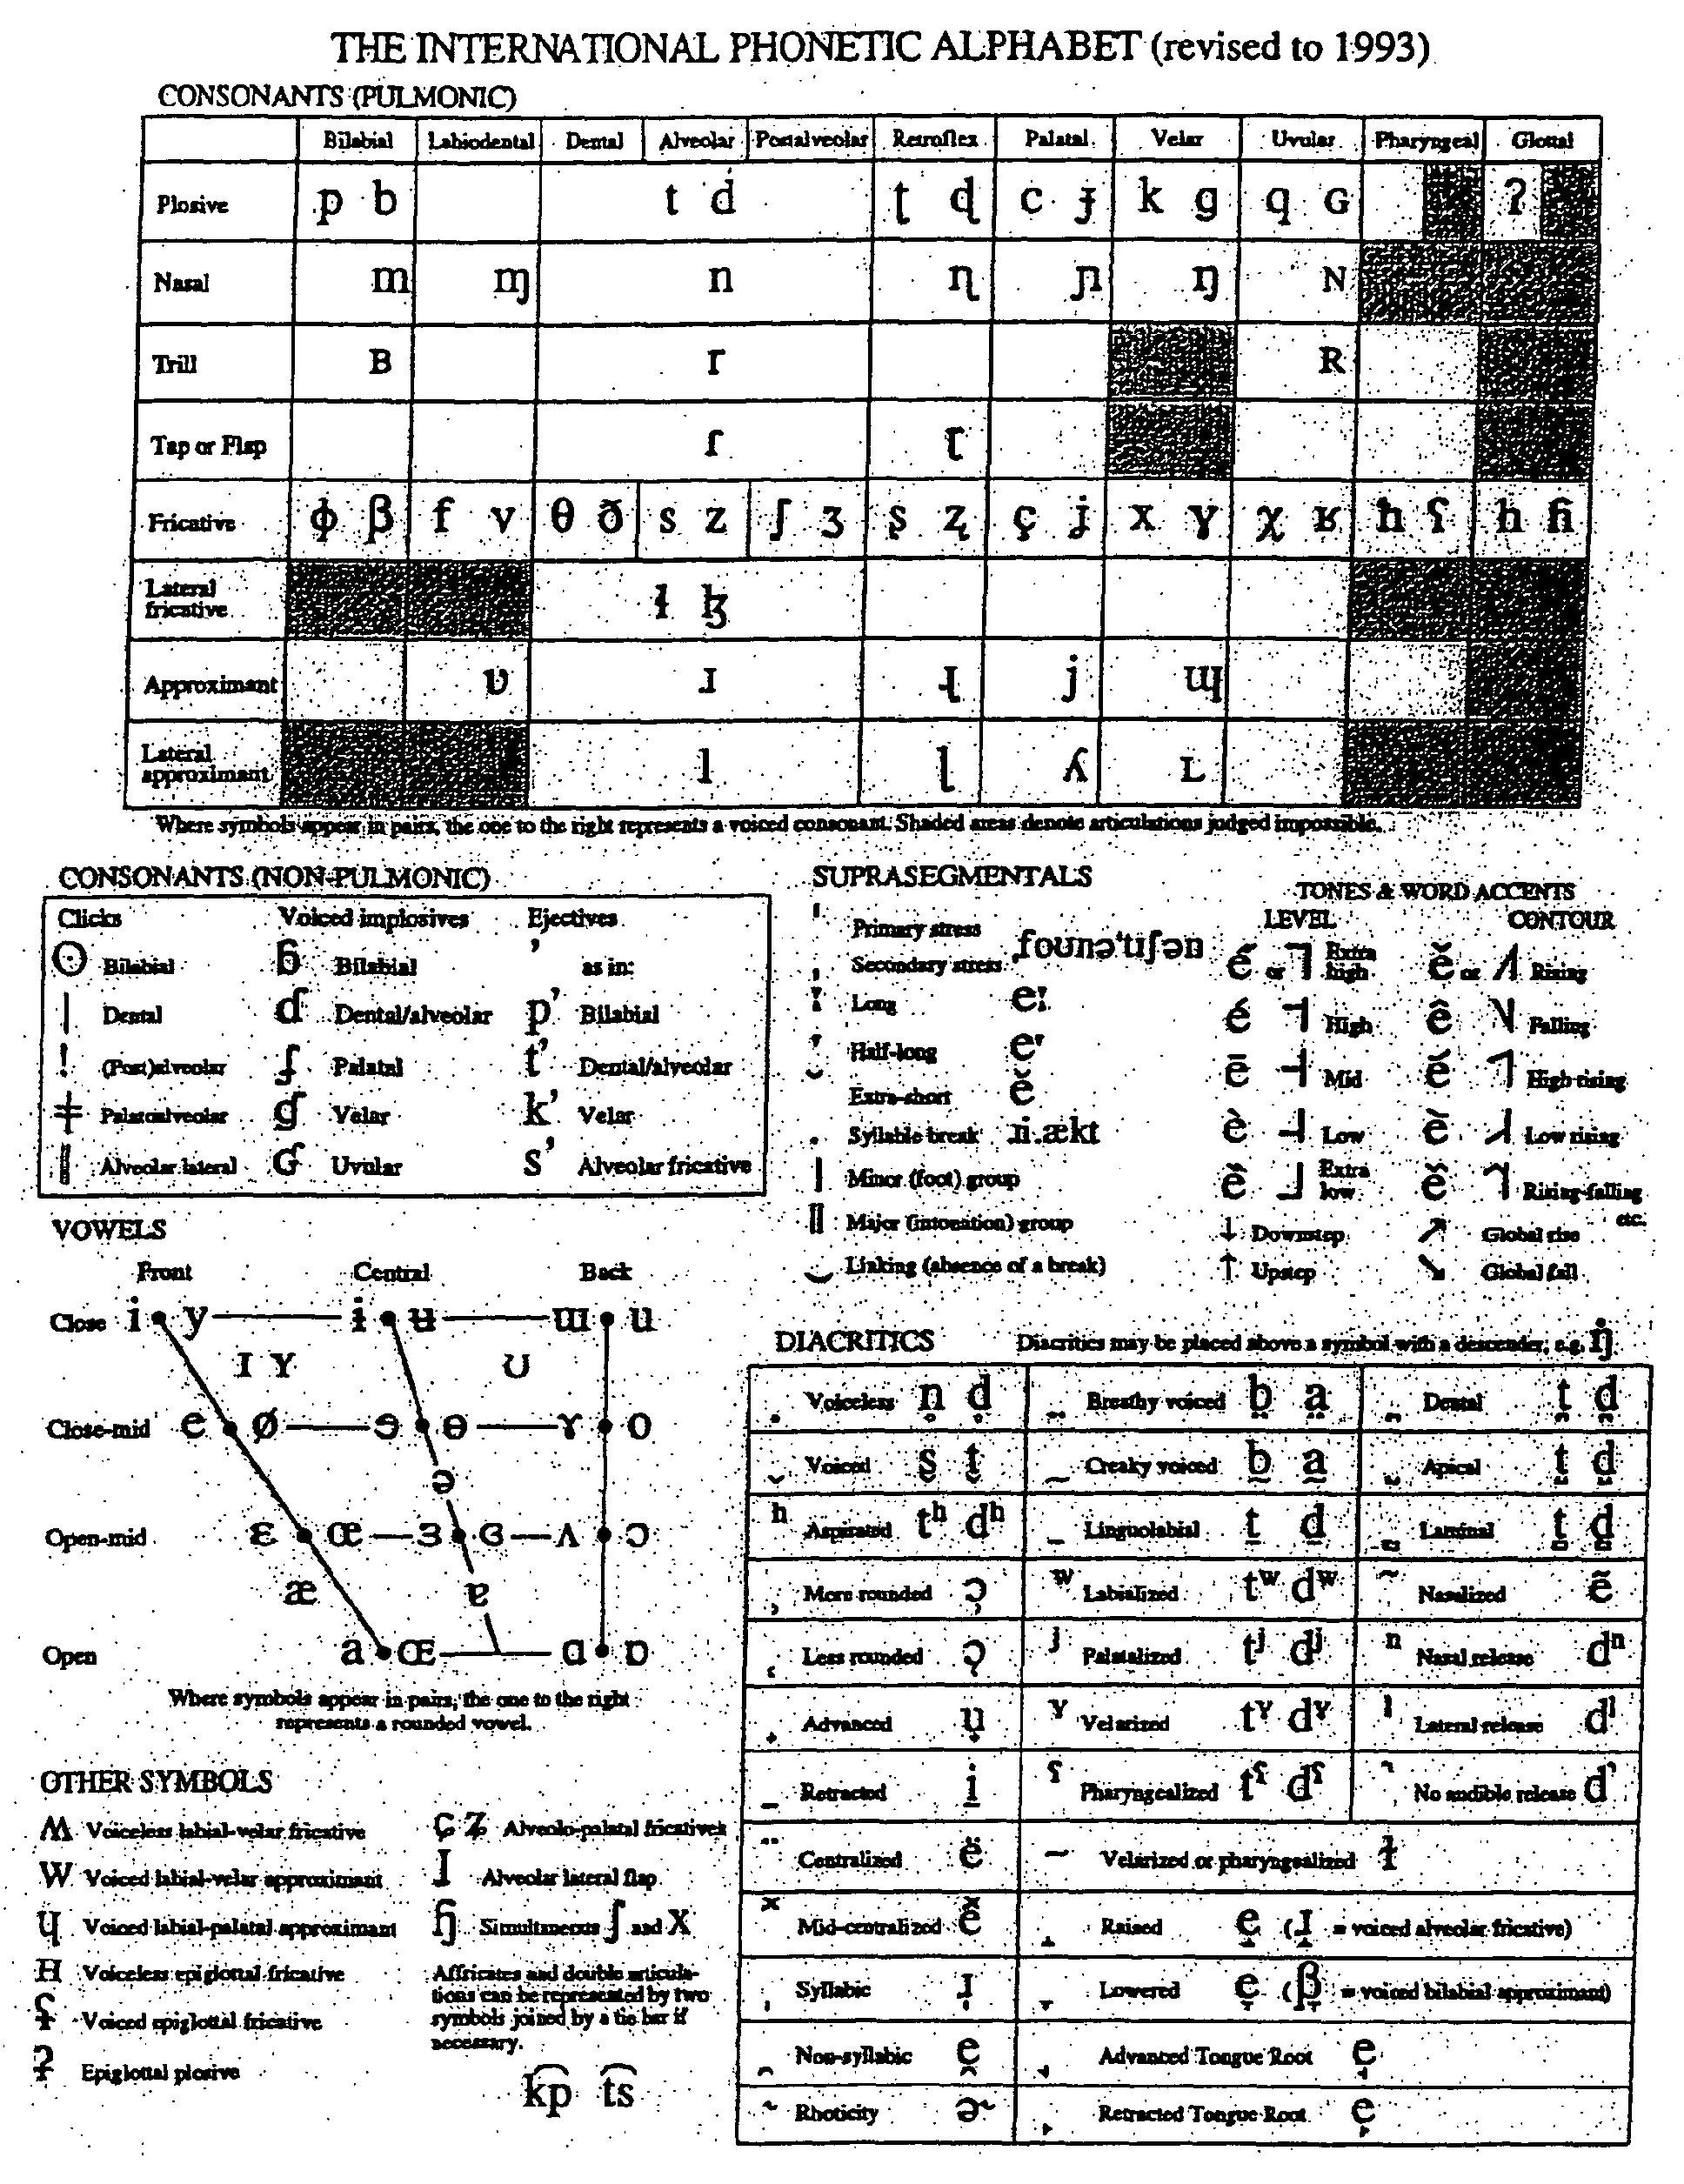 Ep1251490a1 compact phonetic model for arabic languages figure 00070001 buycottarizona